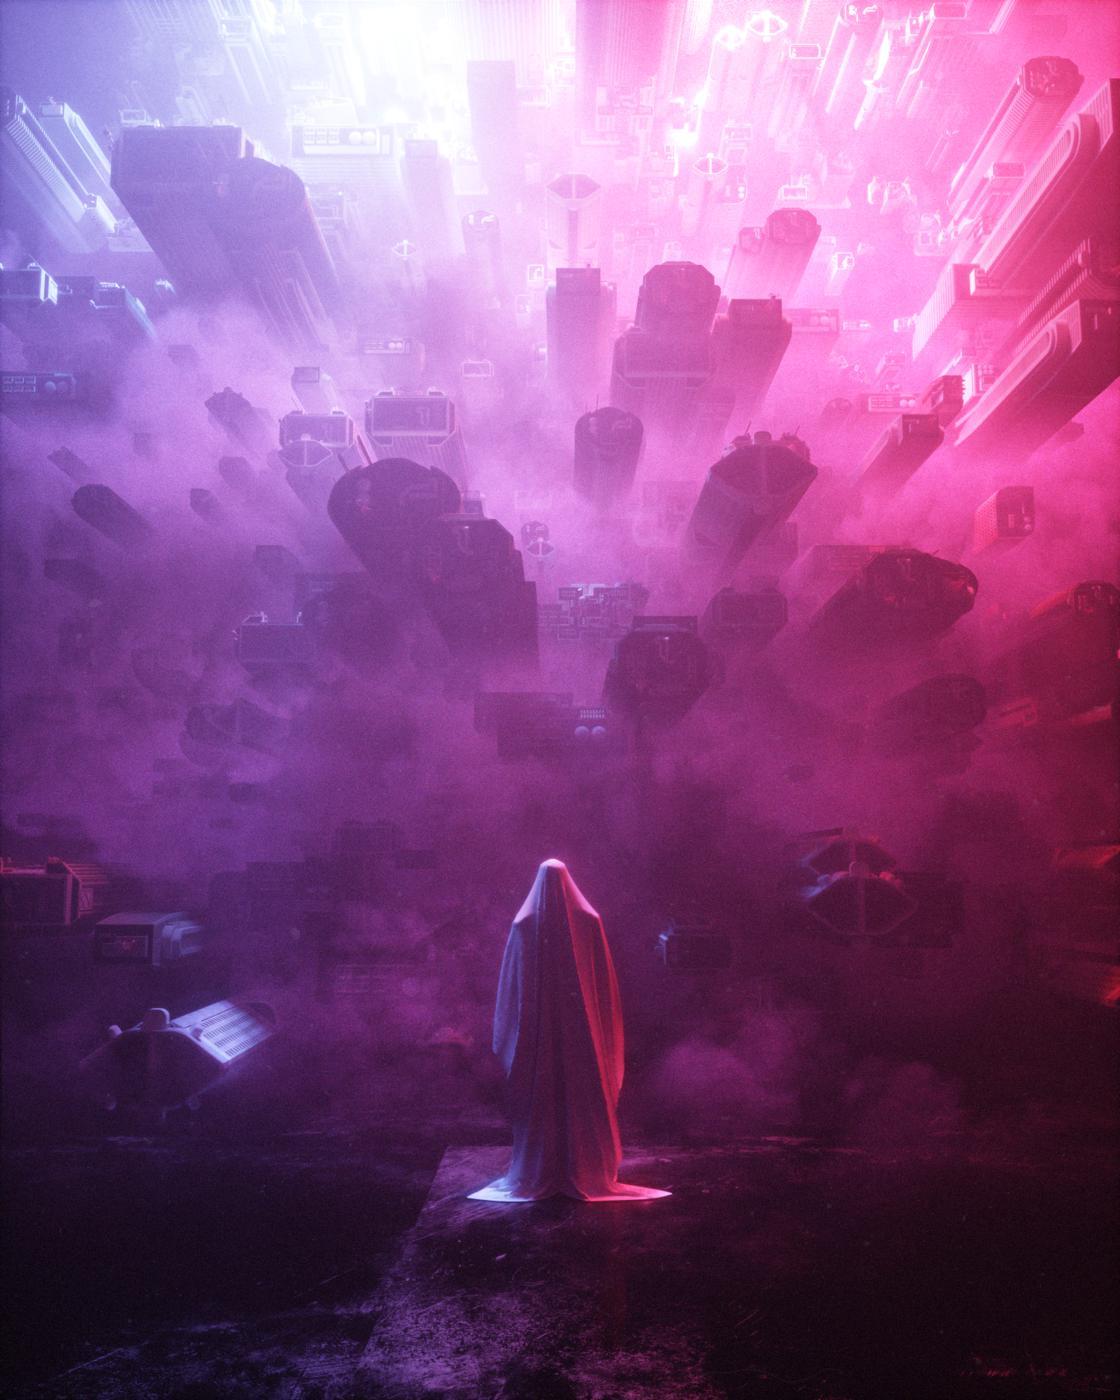 Dark Future – Les illustrations sombres et futuristes de Stuart Lippincott